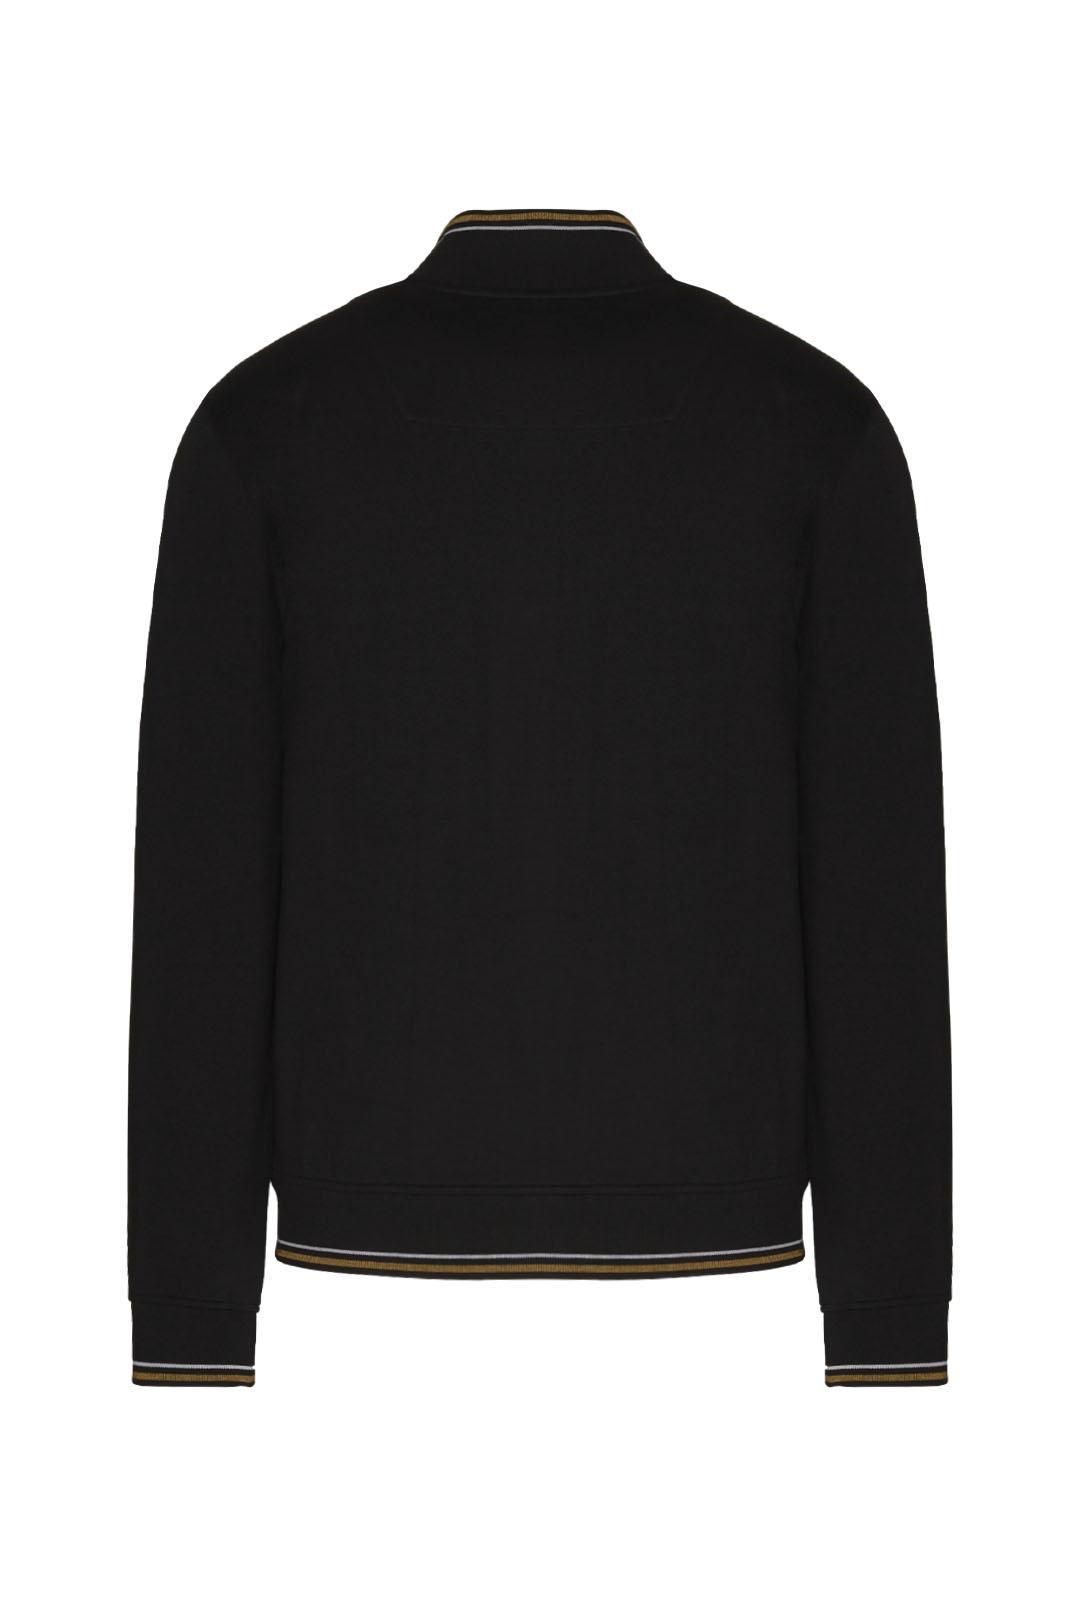 Frecce Tricolori Baumwolle-Sweatshirt    2